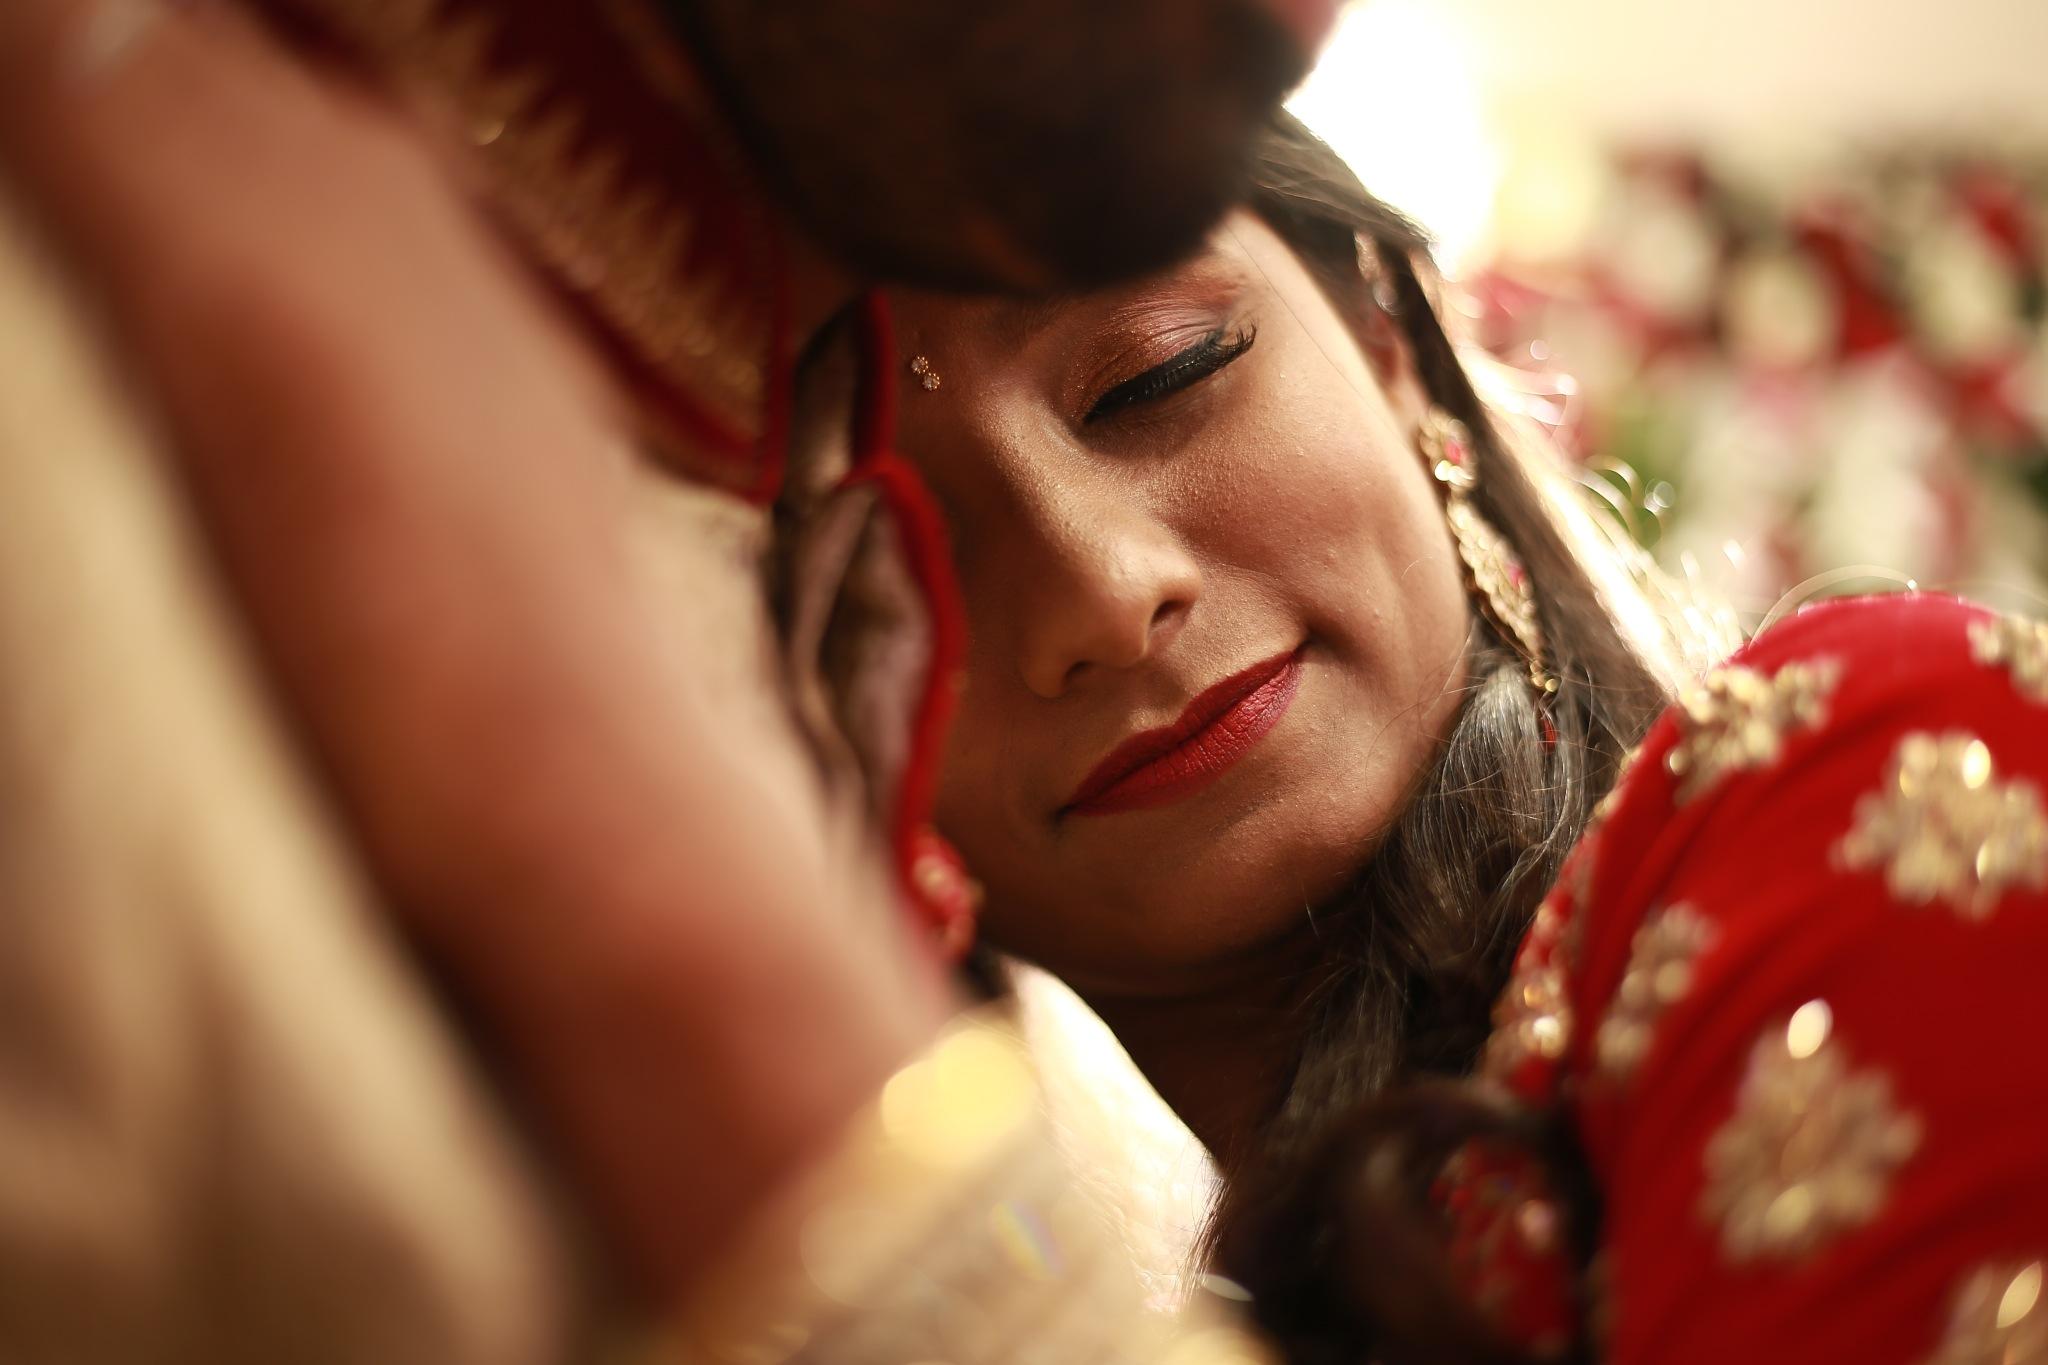 Wedding shoot by Dagupati Abhiram sai